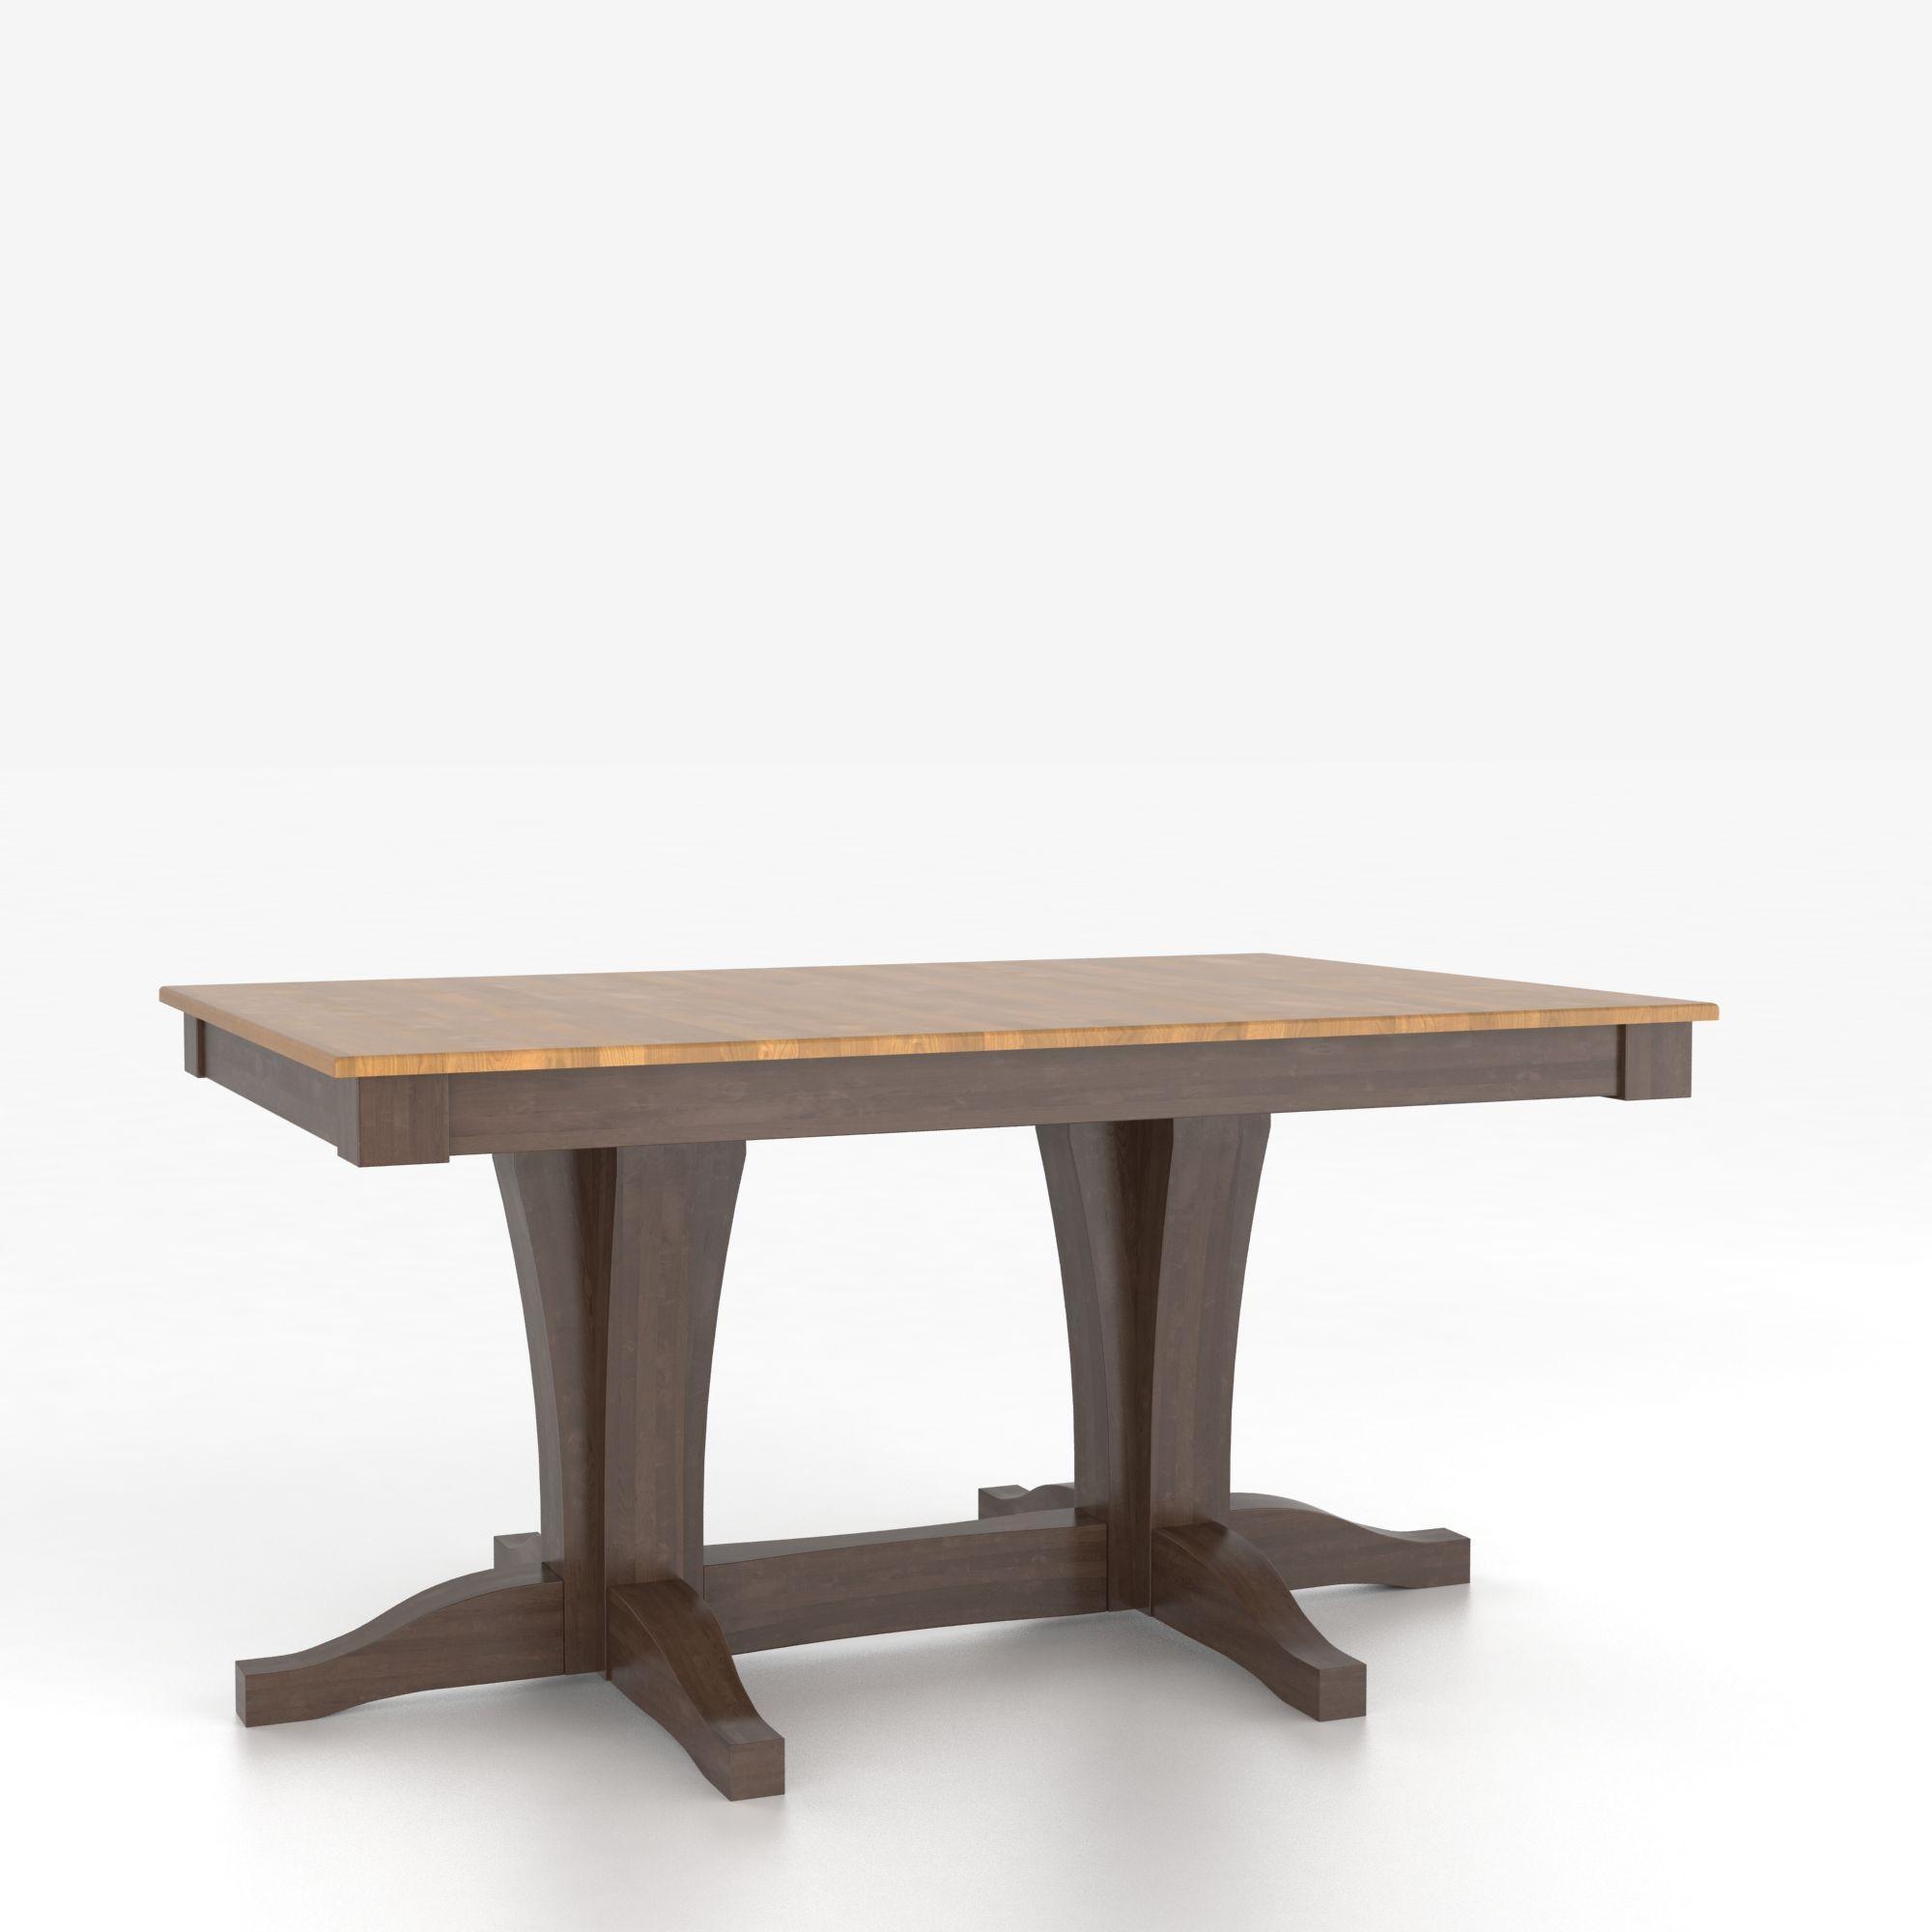 canadel custom dining tables customizable rectangular table with pedestal darvin furniture. Black Bedroom Furniture Sets. Home Design Ideas